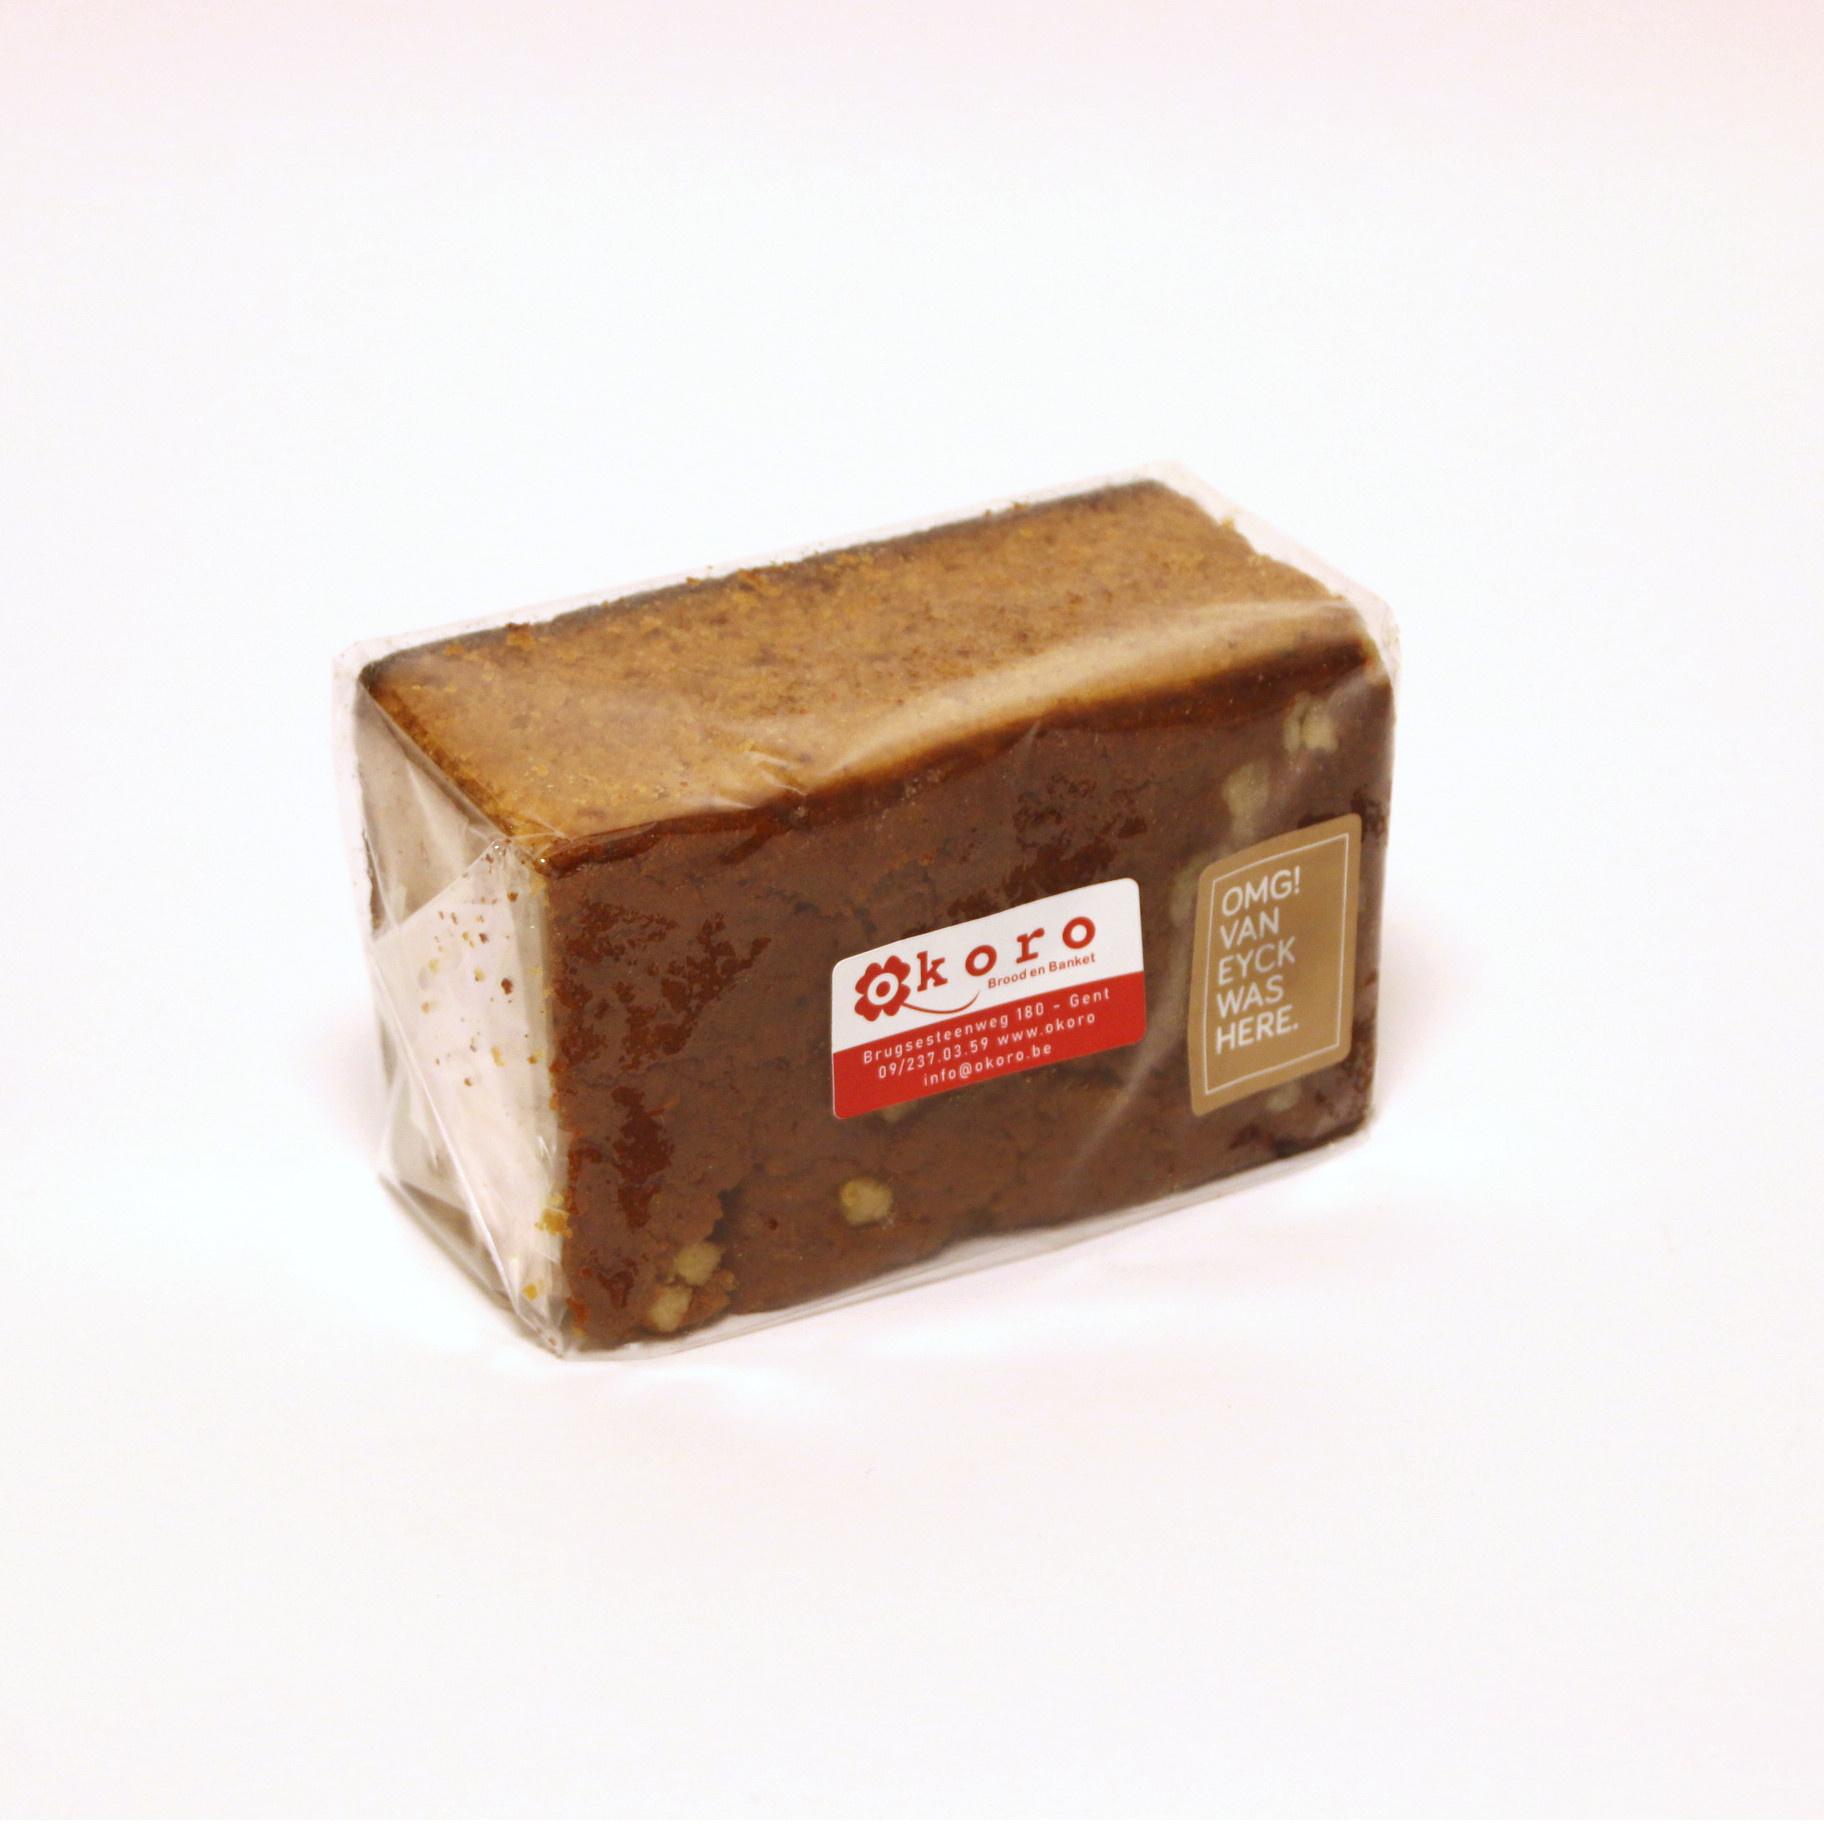 Okoro Fresh gingerbread with Tierenteyn herb mixture - Bakery Okoro